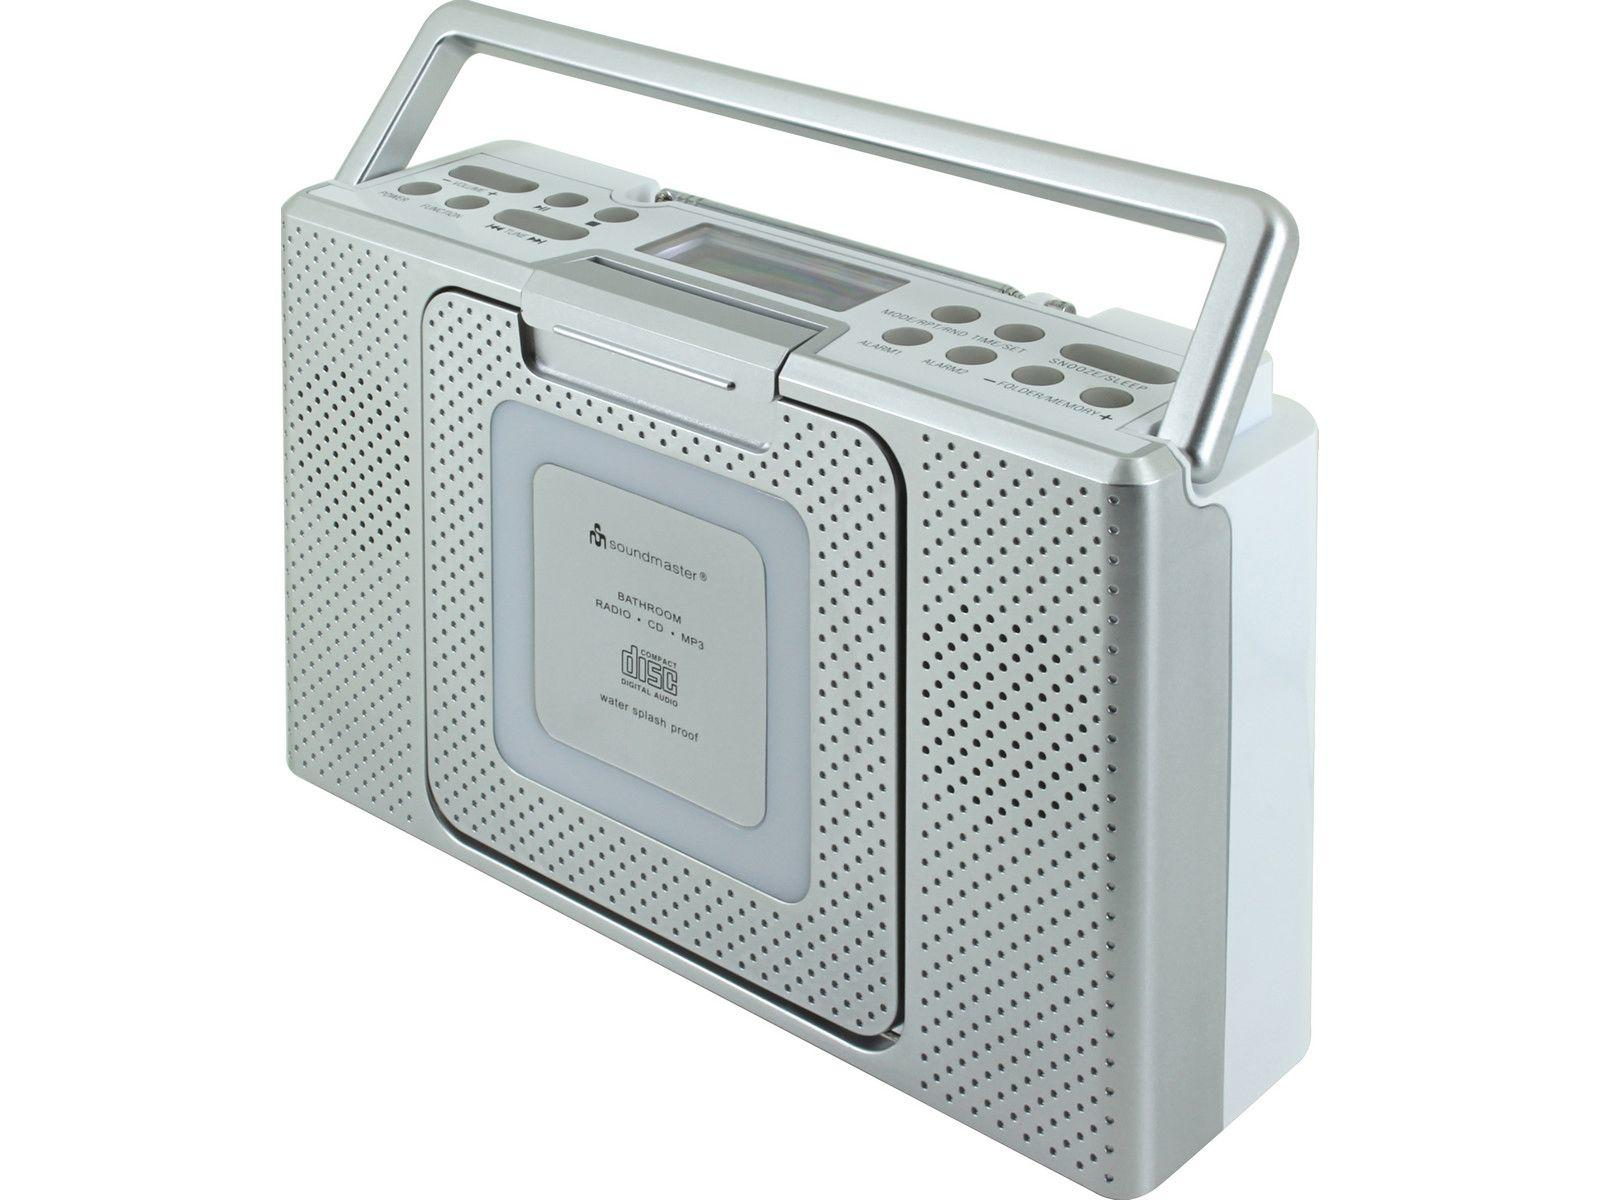 Soundmaster Bcd480 Splashproof Portable Fm Radio Cd Player Full View Of In Silver